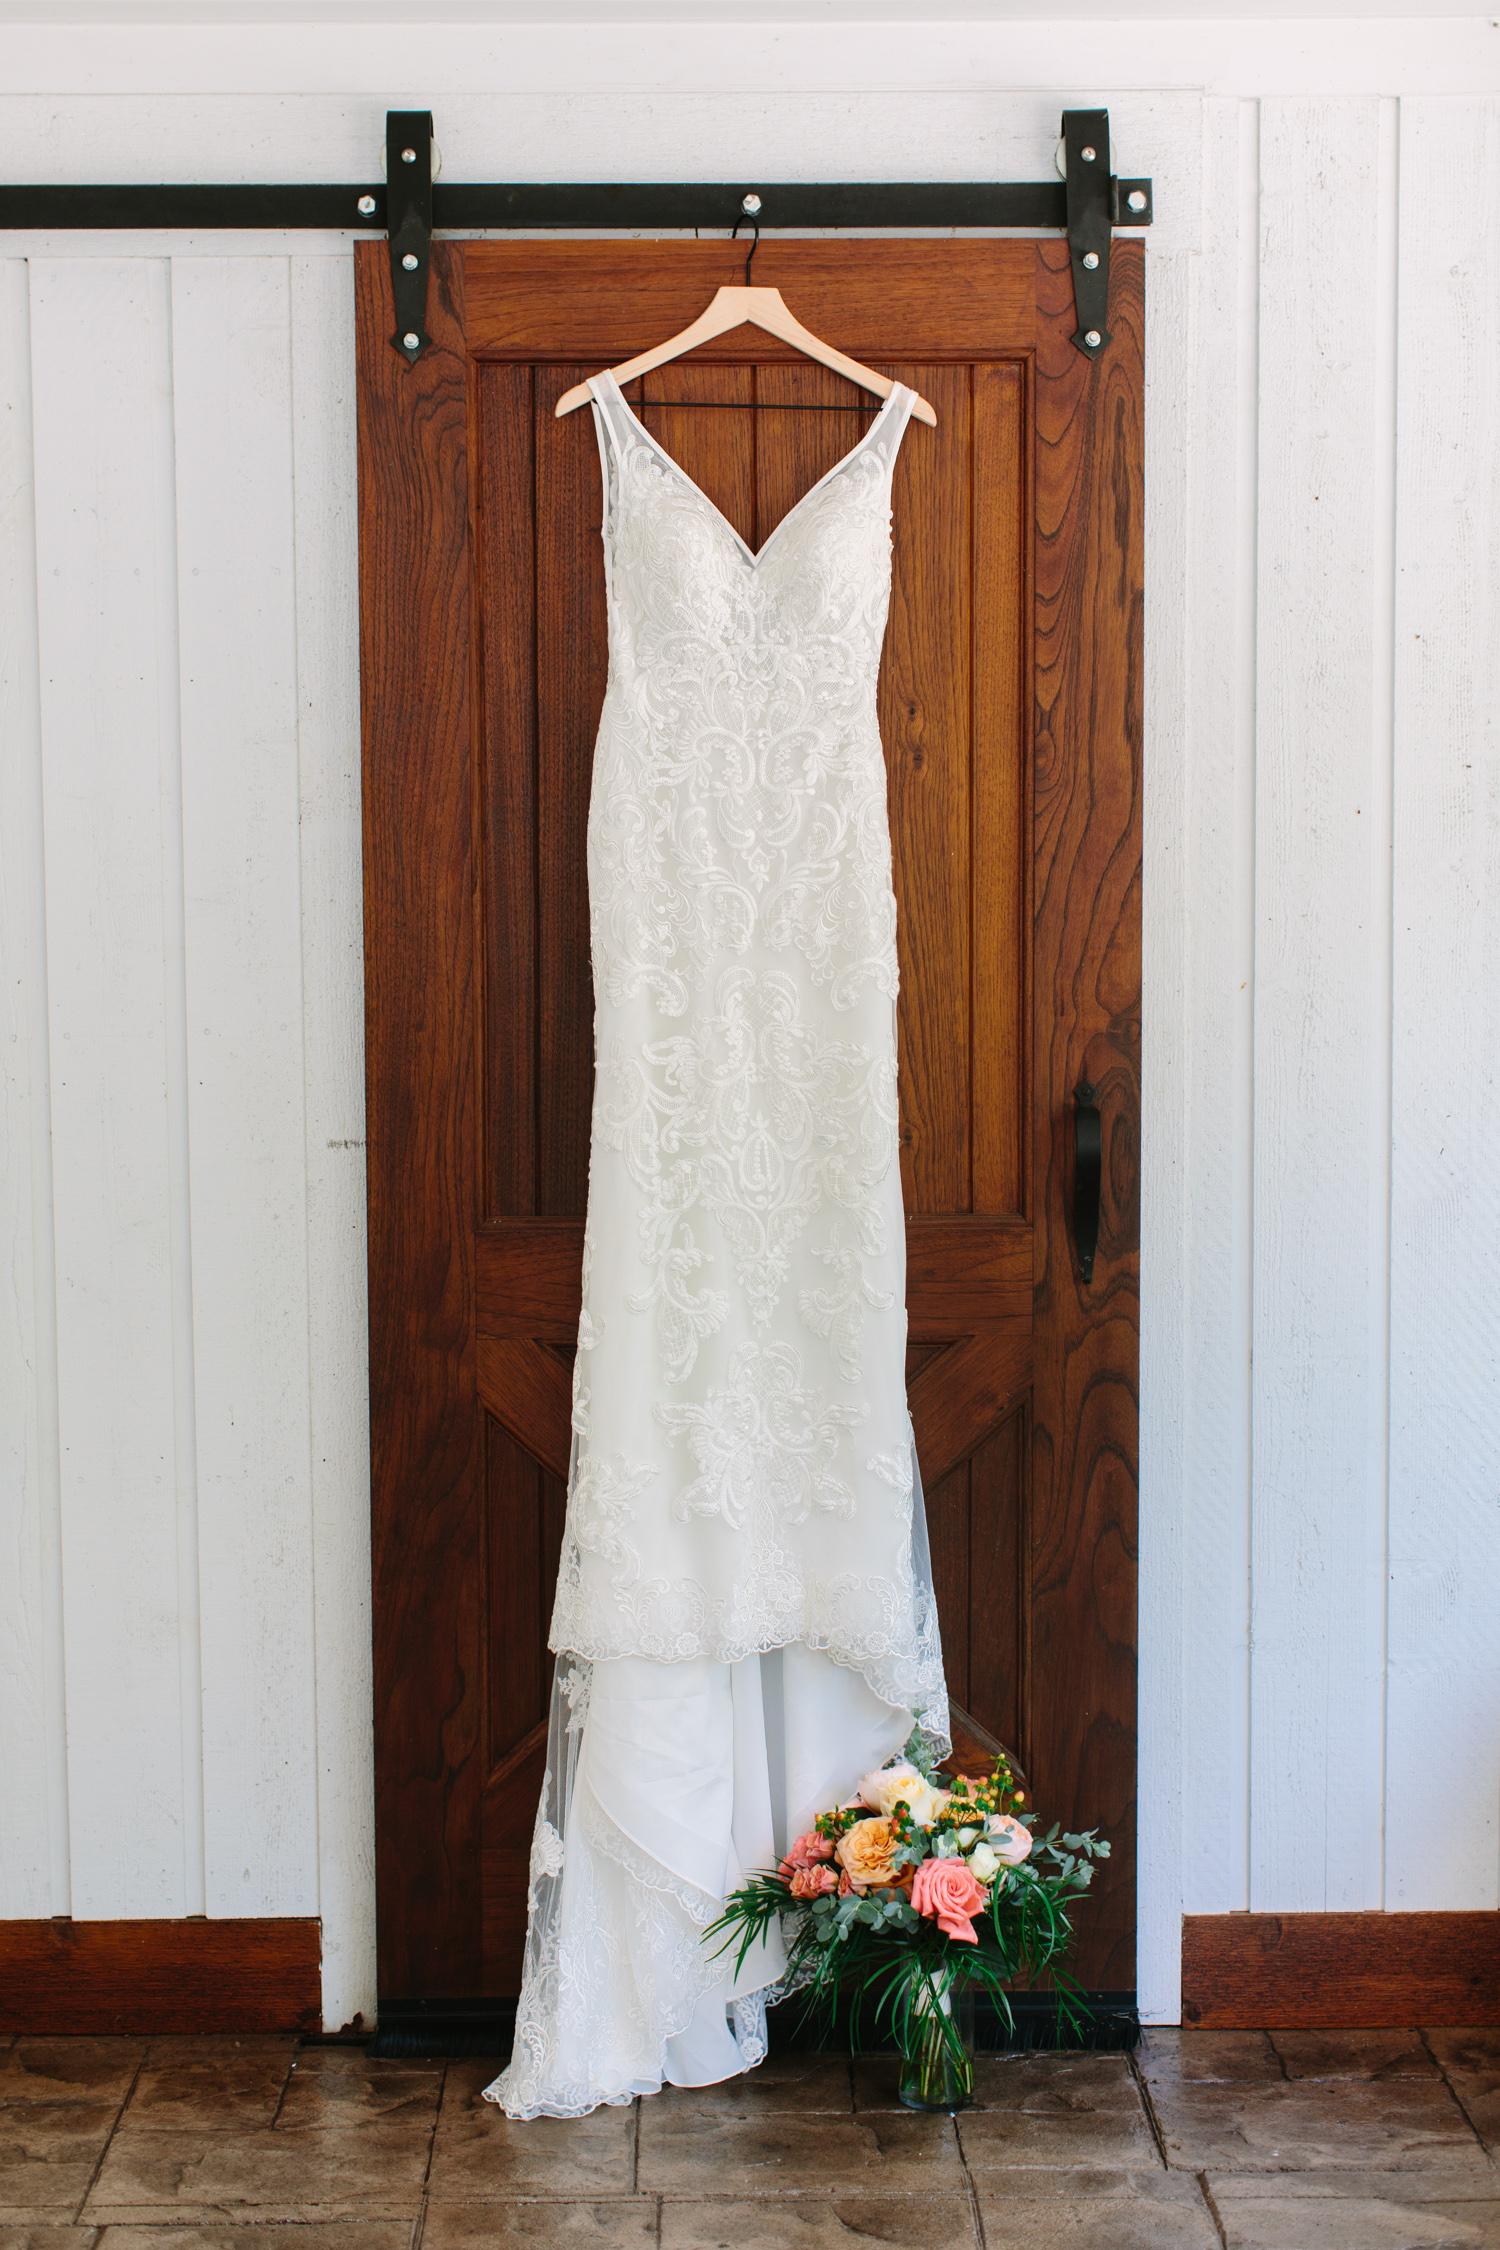 Essence of Australia Wedding Dress // Tennessee Photographer // Suzy Collins Photography // The Olde Farm